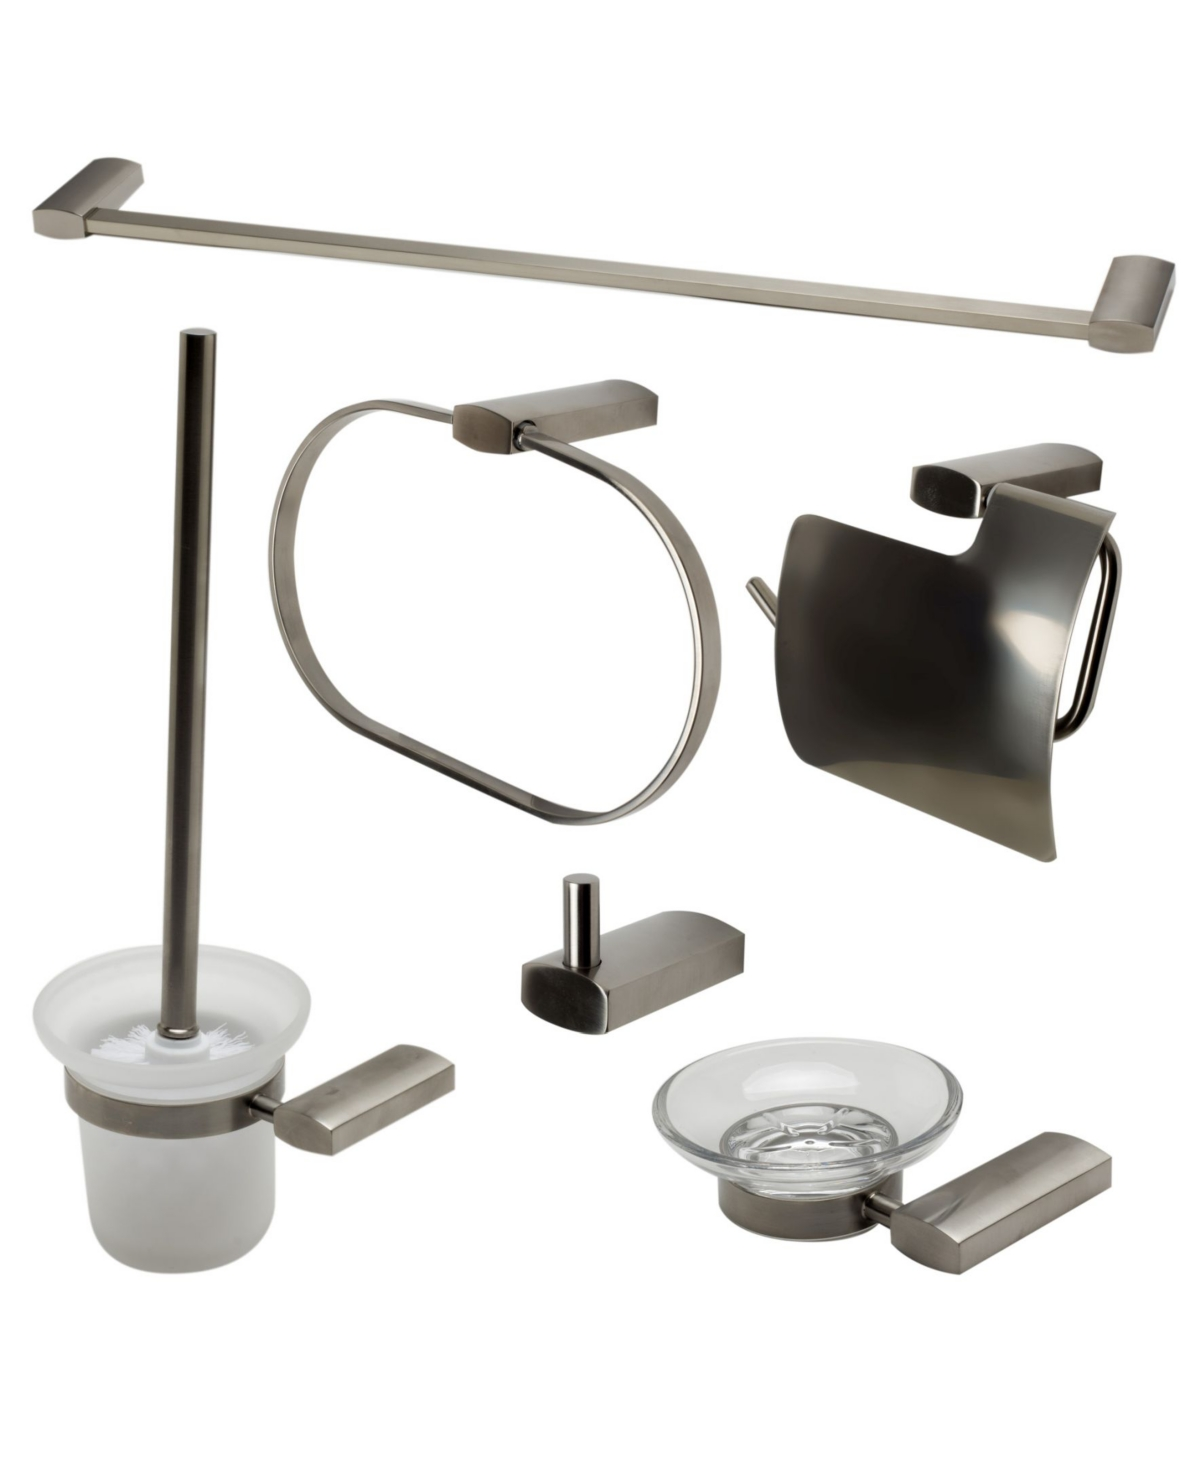 Alfi brand Brushed Nickel Matching Bathroom Accessory Set, 6 Piece Bedding